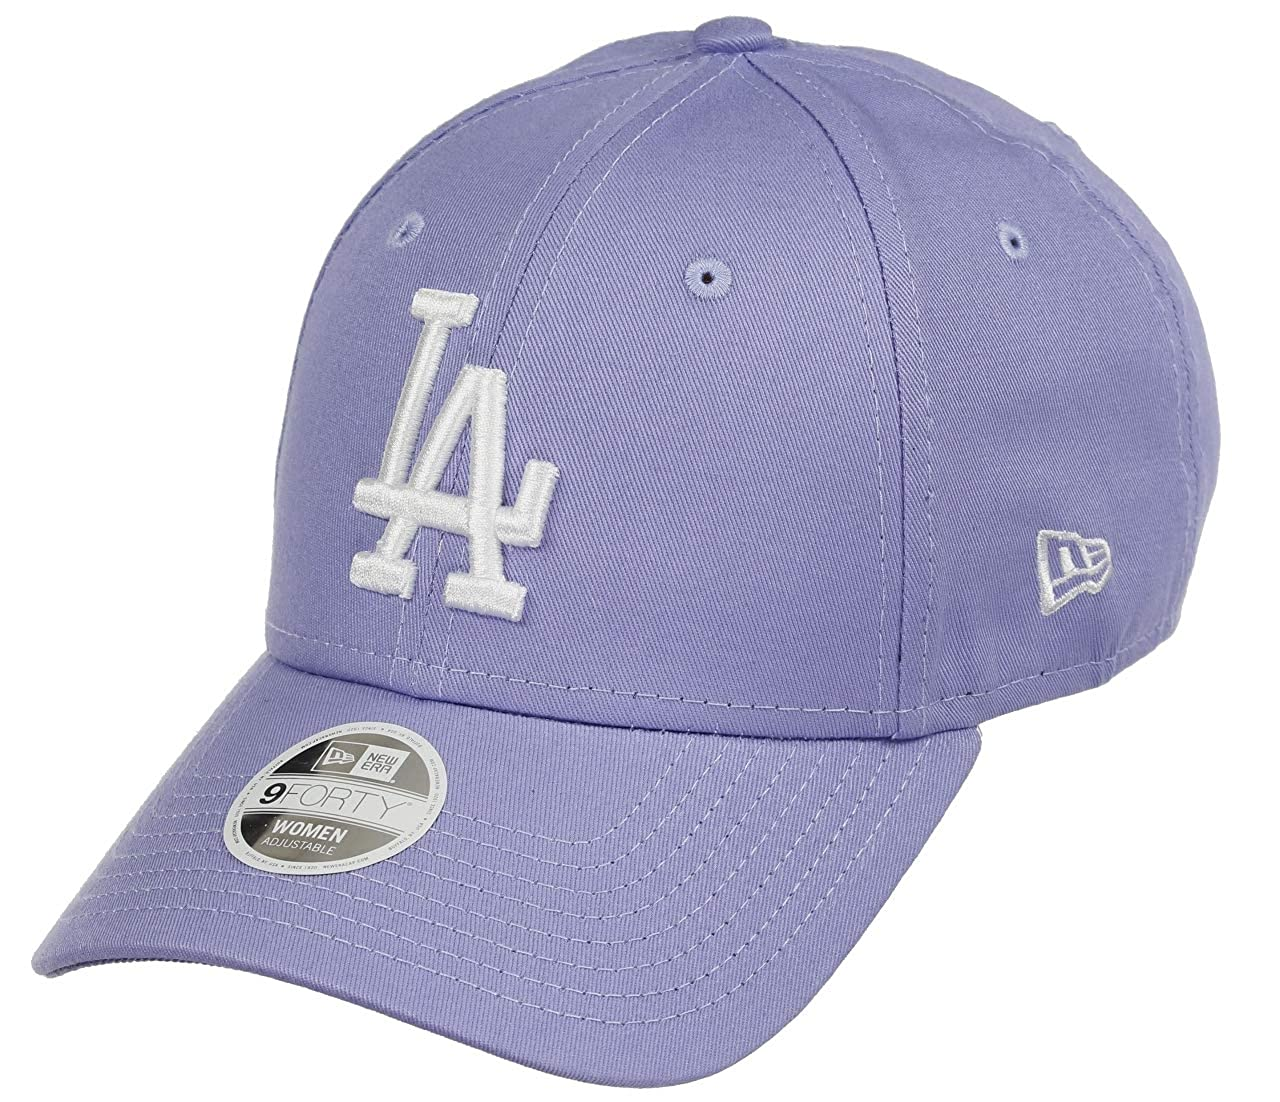 9dca5456 New Era Los Angeles Dodgers 9forty Adjustable Women Cap League ...